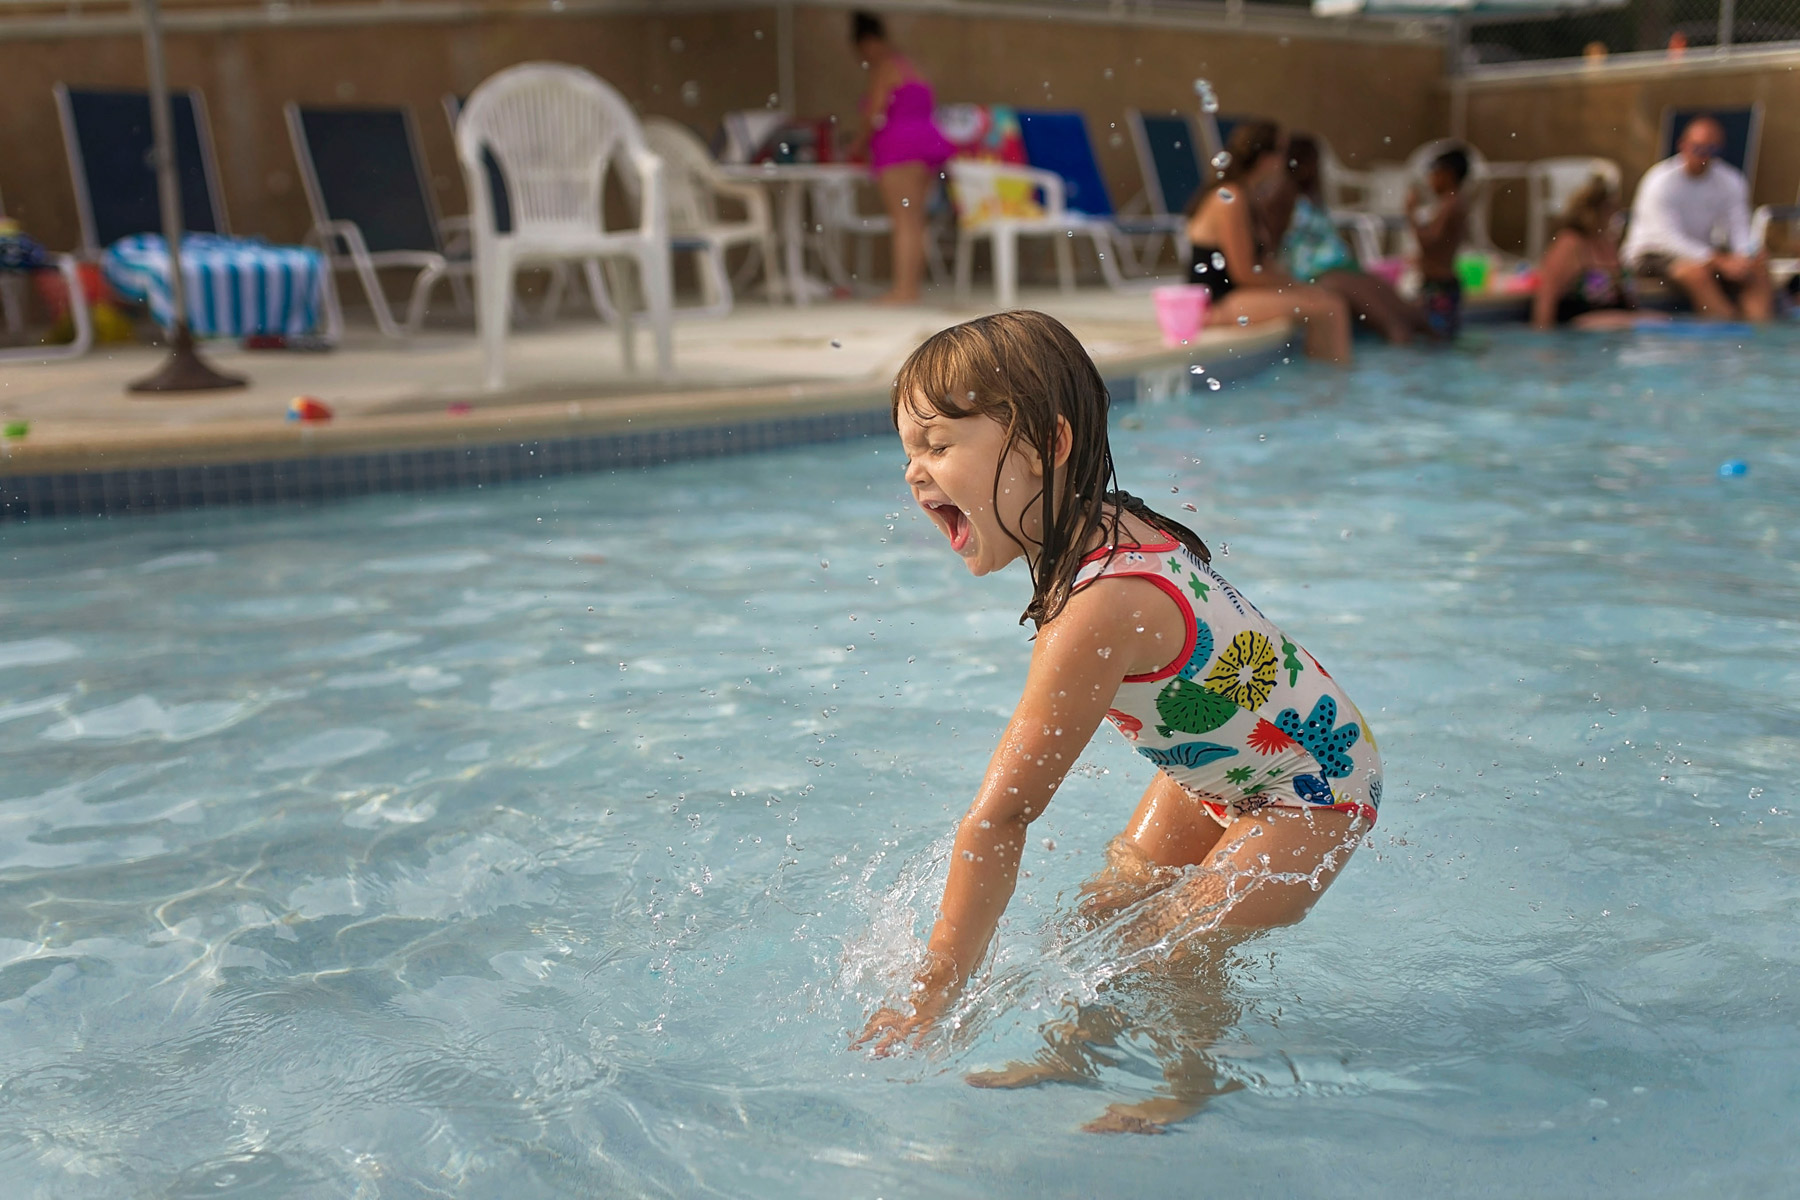 4 year old splashing in the pool